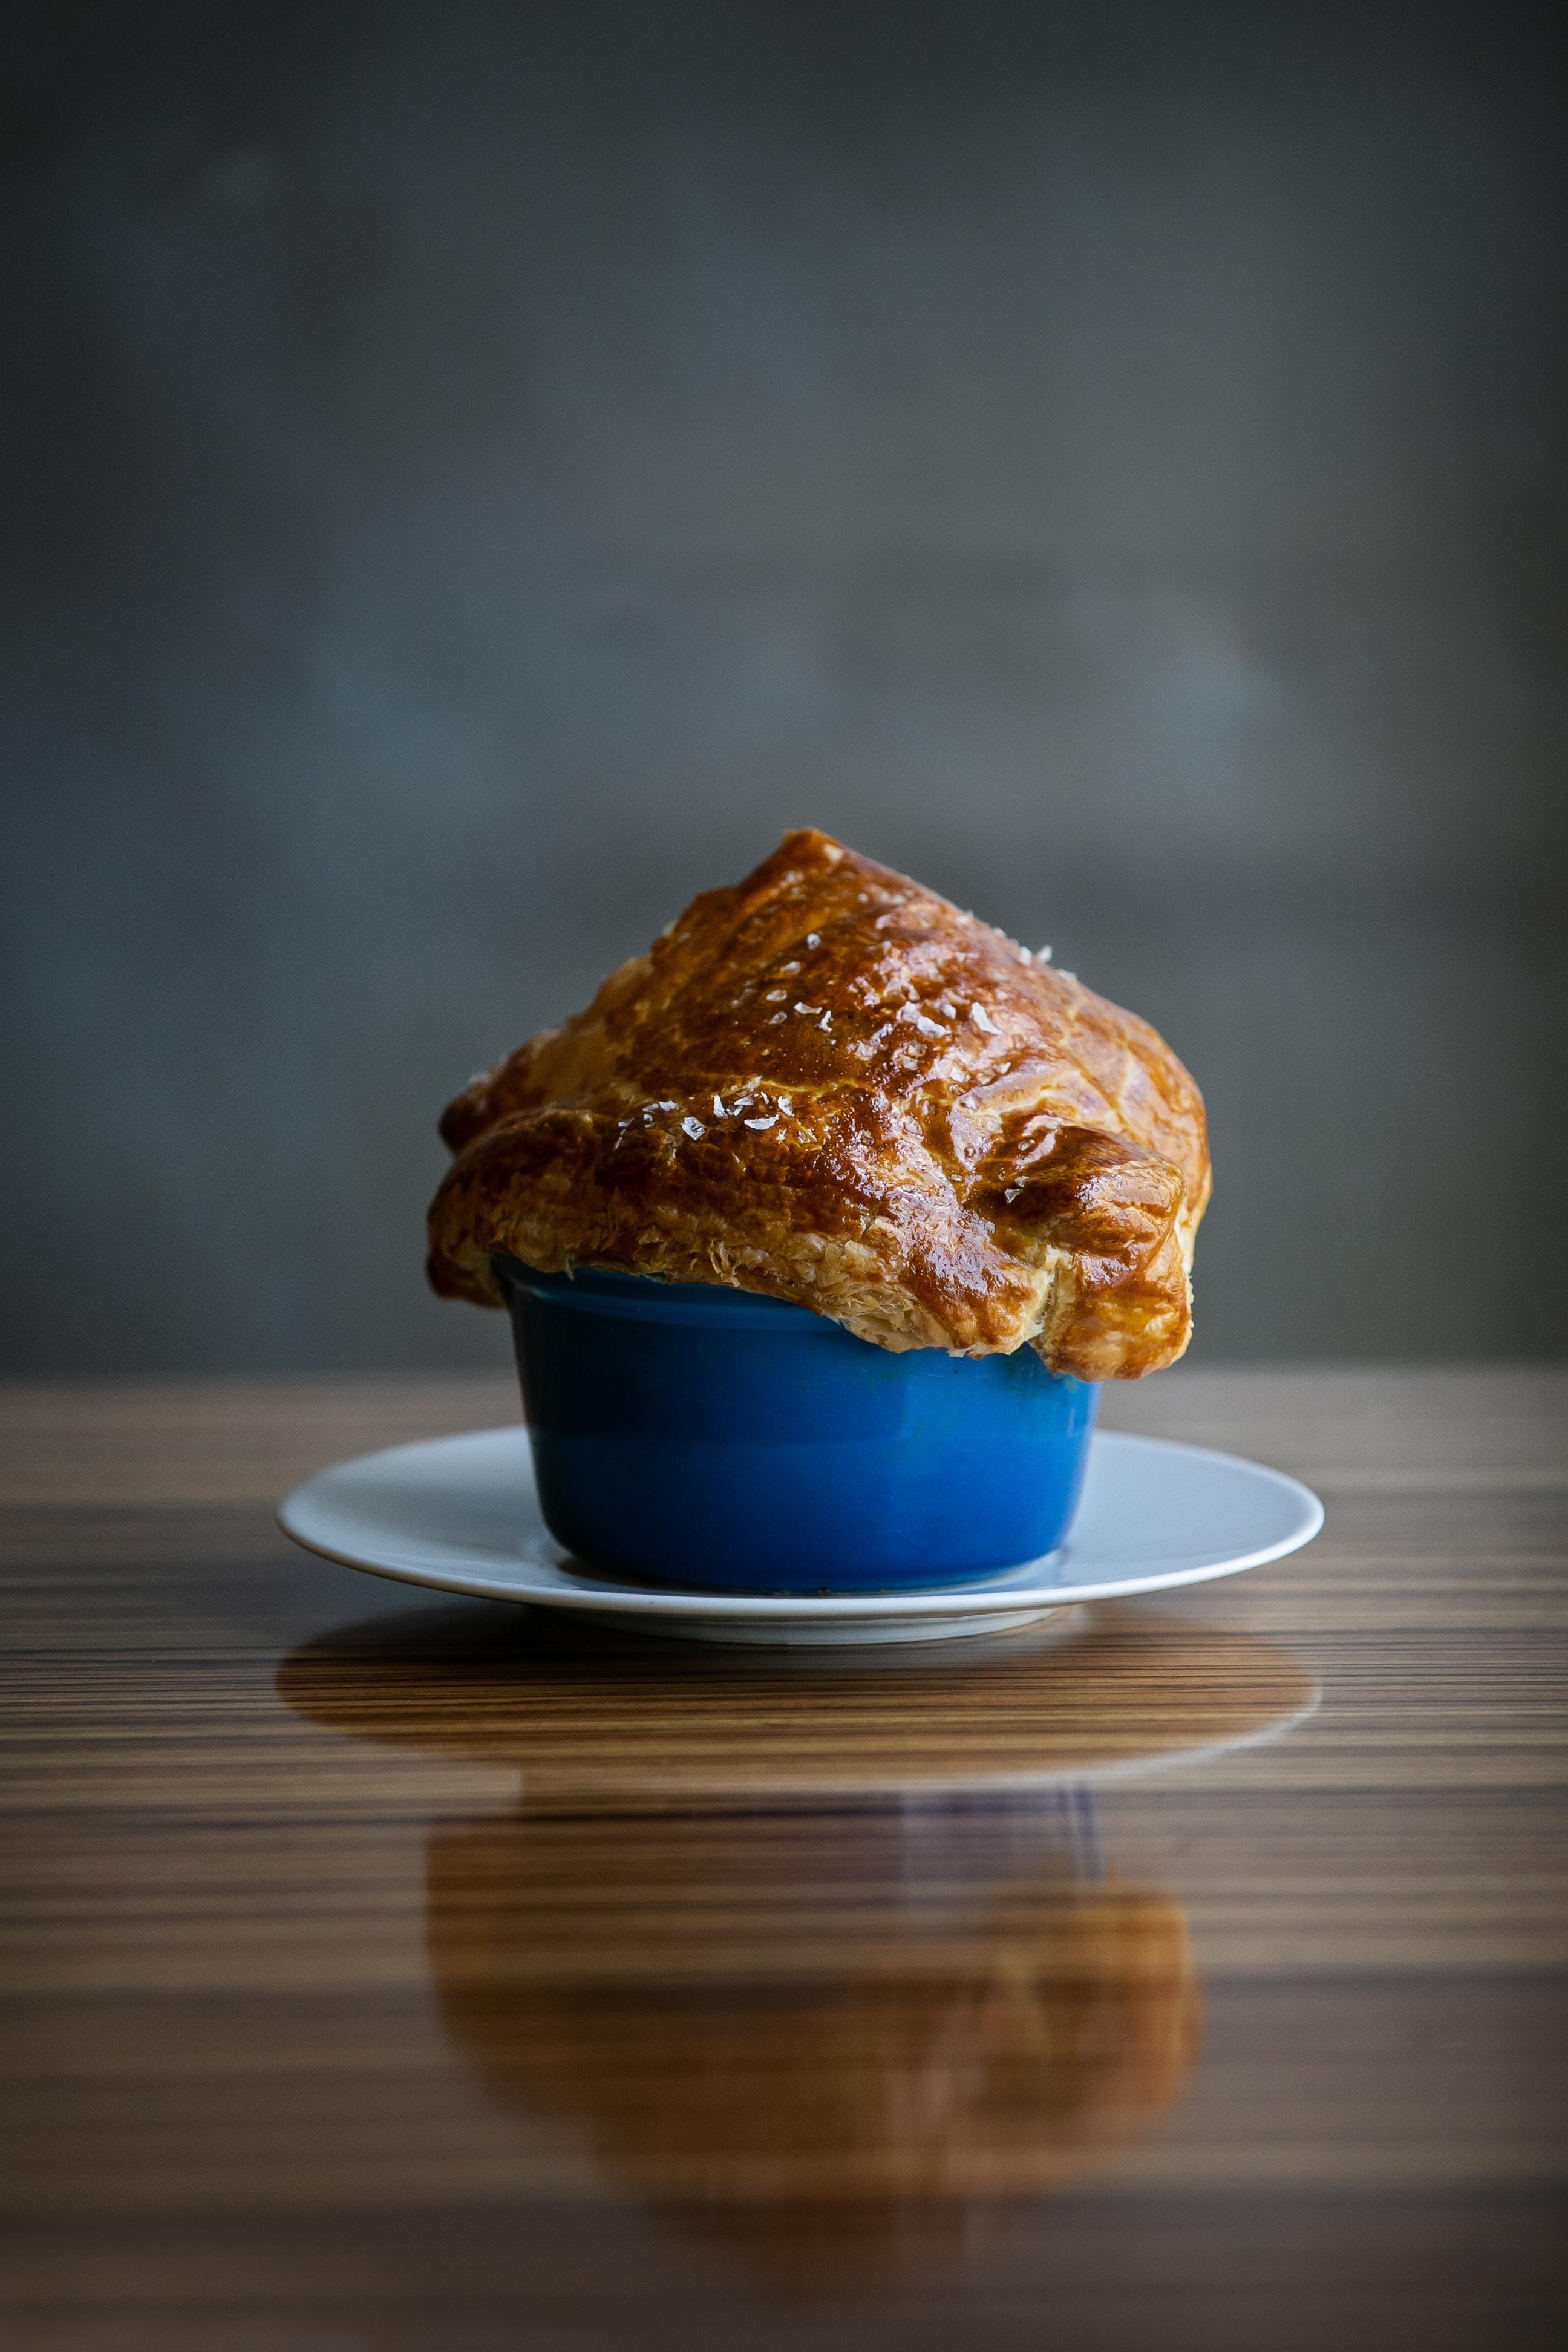 Southwest's New Global Bistro Serves 'Du Jour' Plates Like Pot Pie-Style Veal Stew